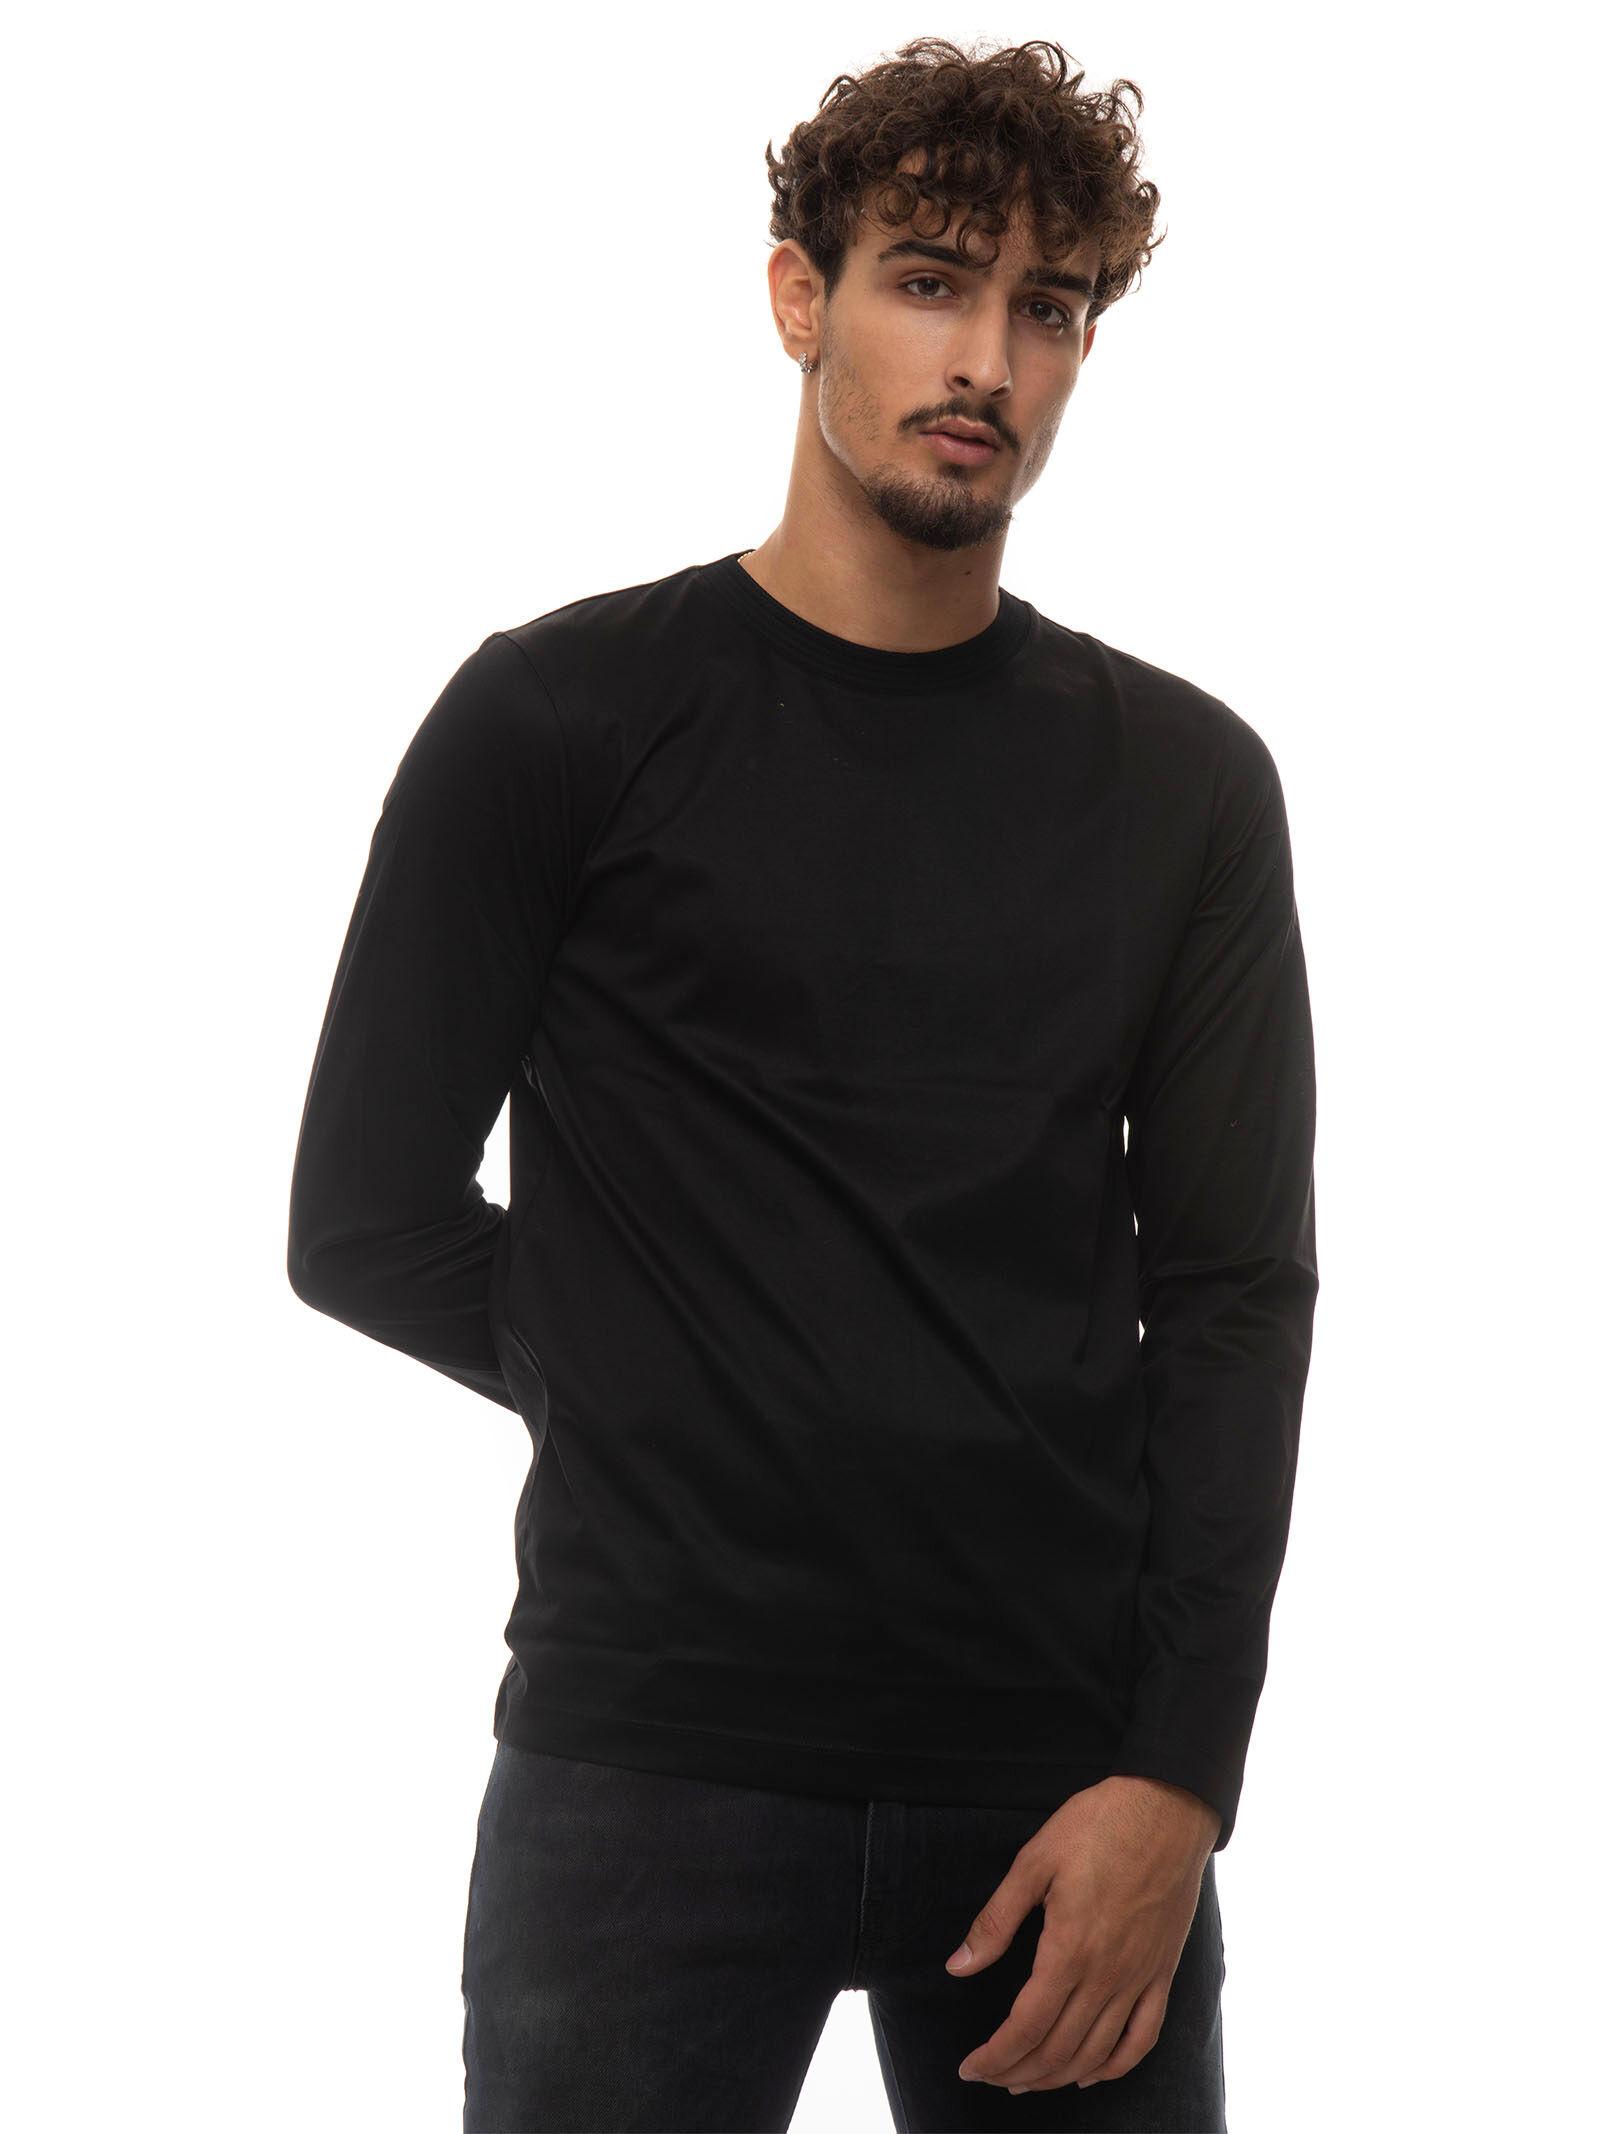 Boss T-shirt manica lunga girocollo TENISON Nero Cotone Uomo